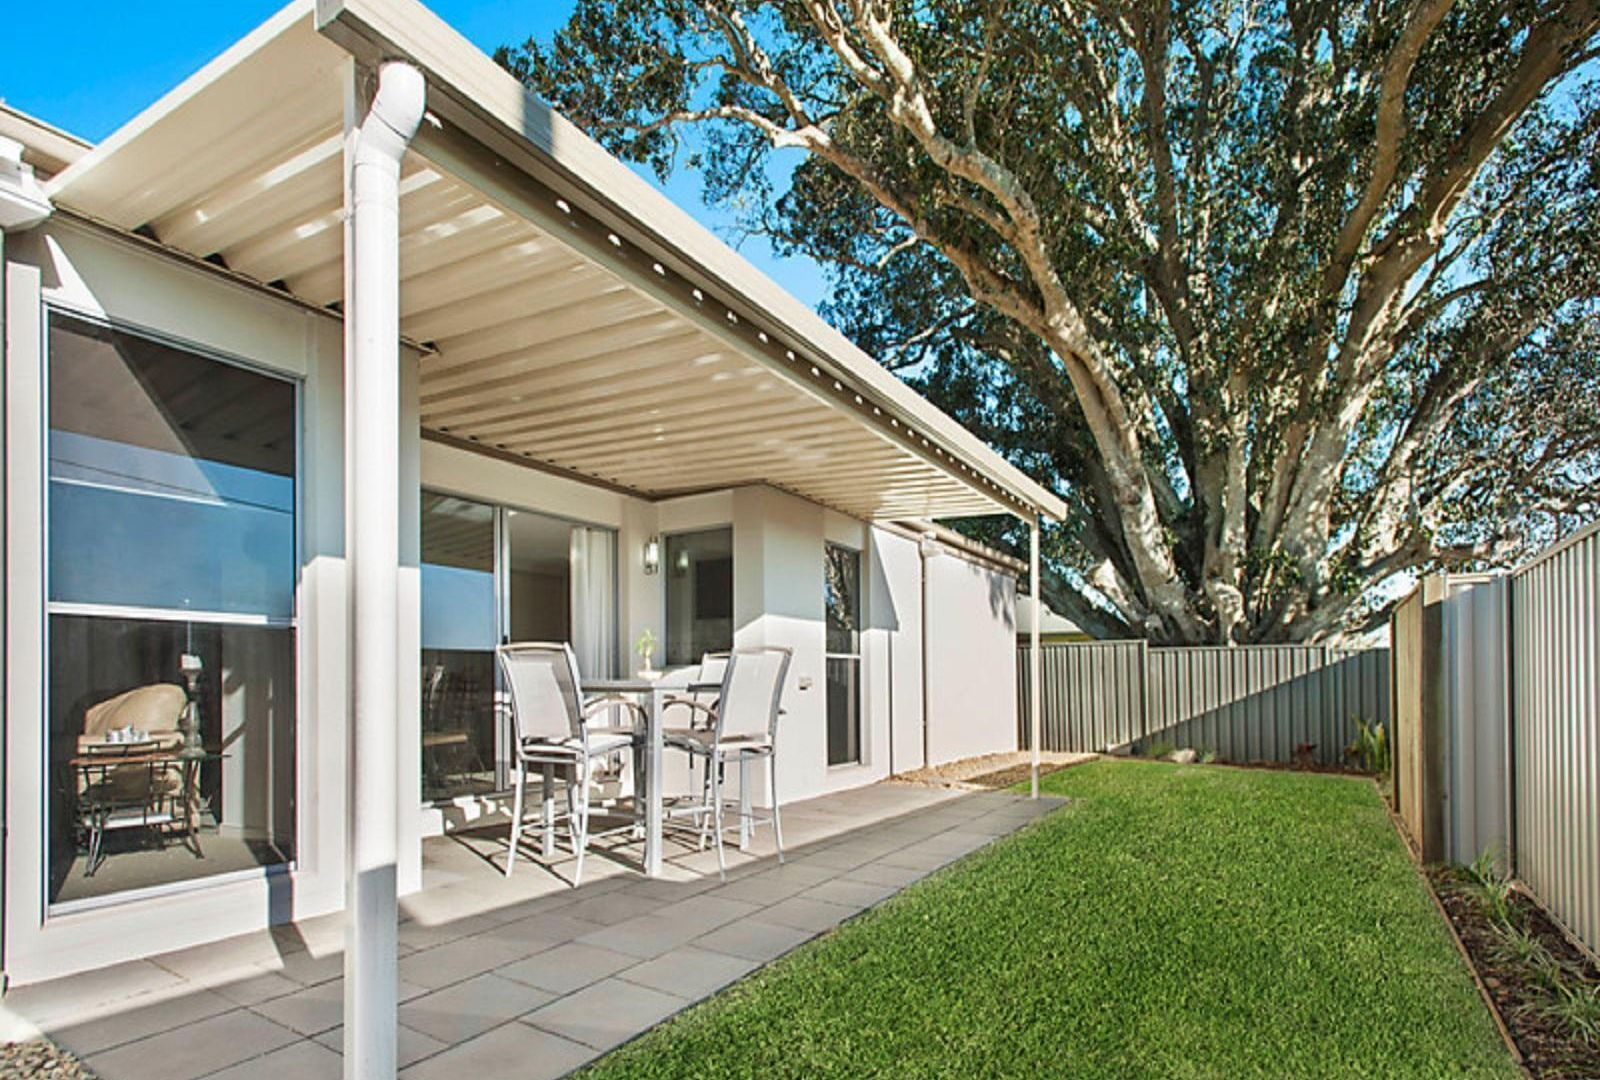 2/16 Argus Court, Middle Ridge QLD 4350, Image 3